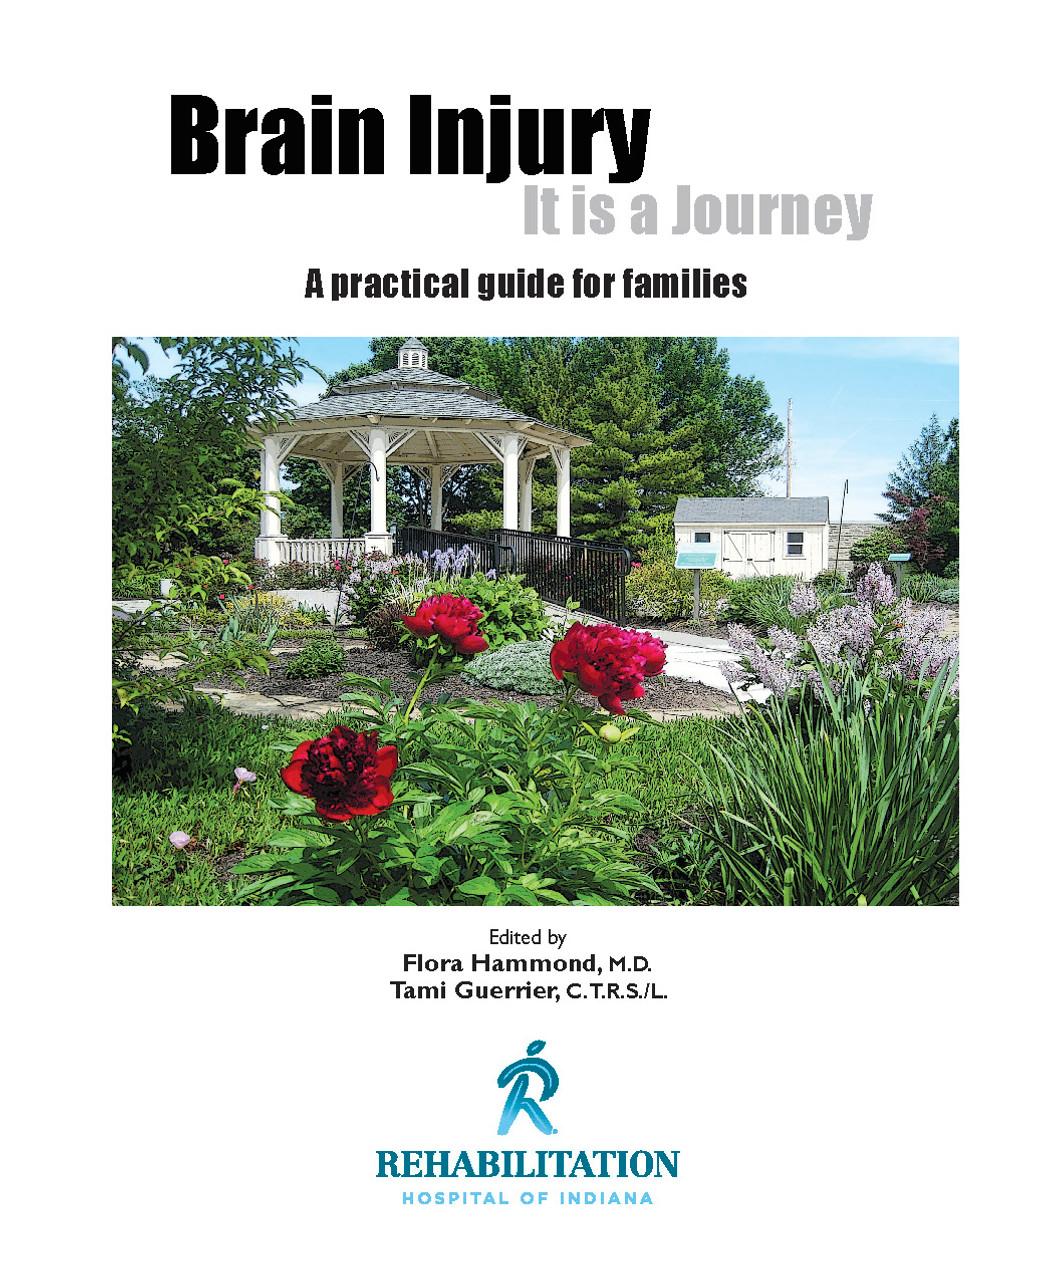 RHIN-BIFJ Brain Injury It's a Journey for Rehabilitation Hospital of Indiana